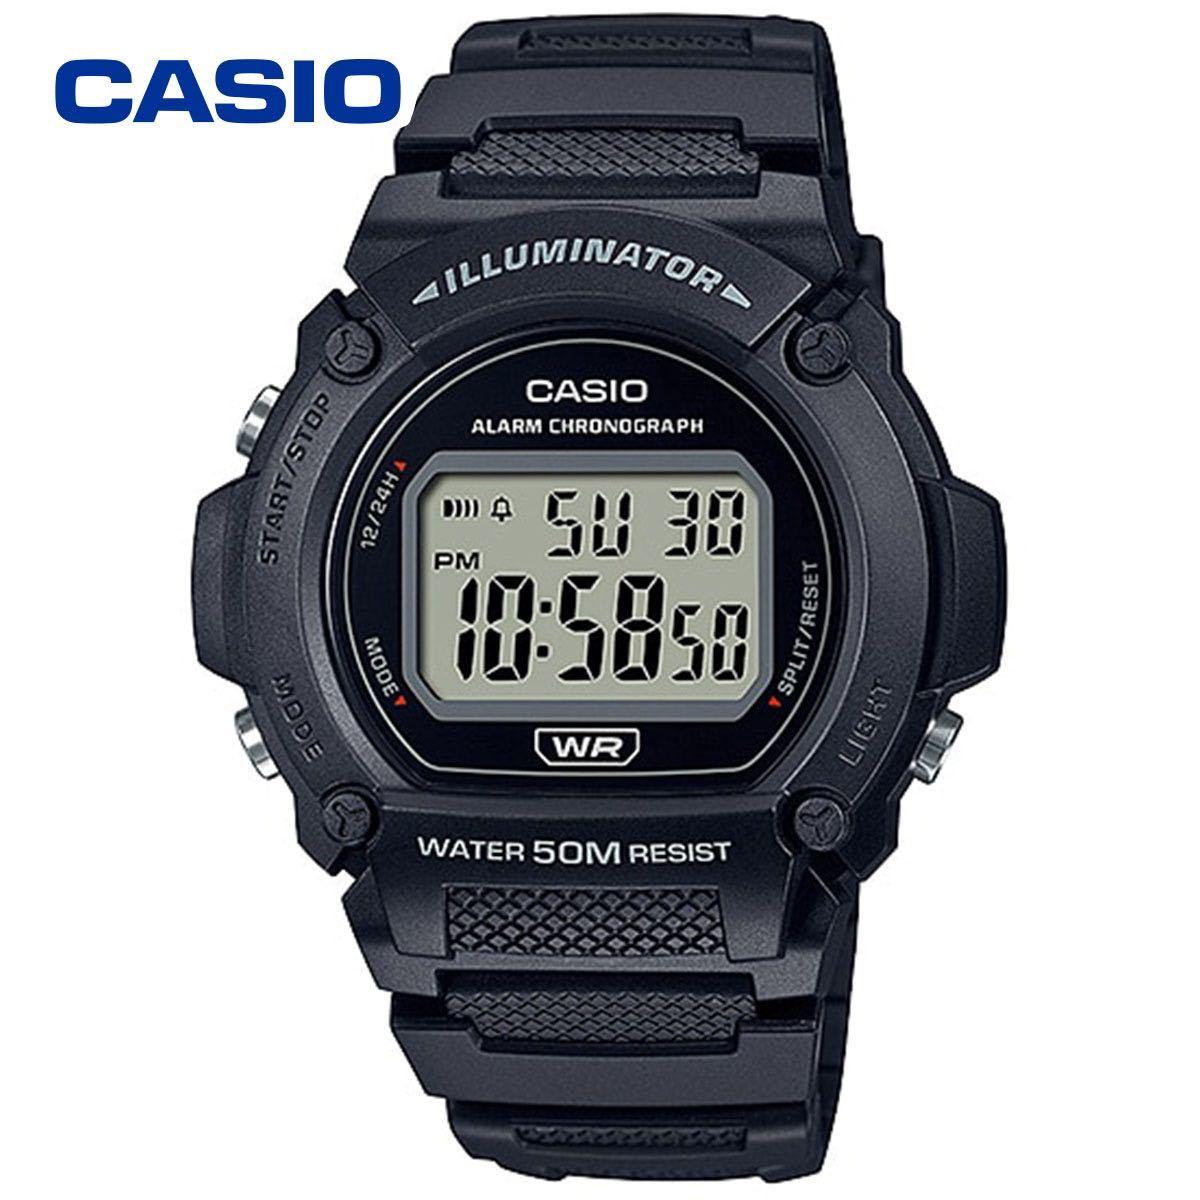 CASIO カシオ 防水 ユニセックス デジタル W219-1A ブラック シンプル メンズ レディース キッズ チープカシオ 男性 女性 子供 腕時計_画像1